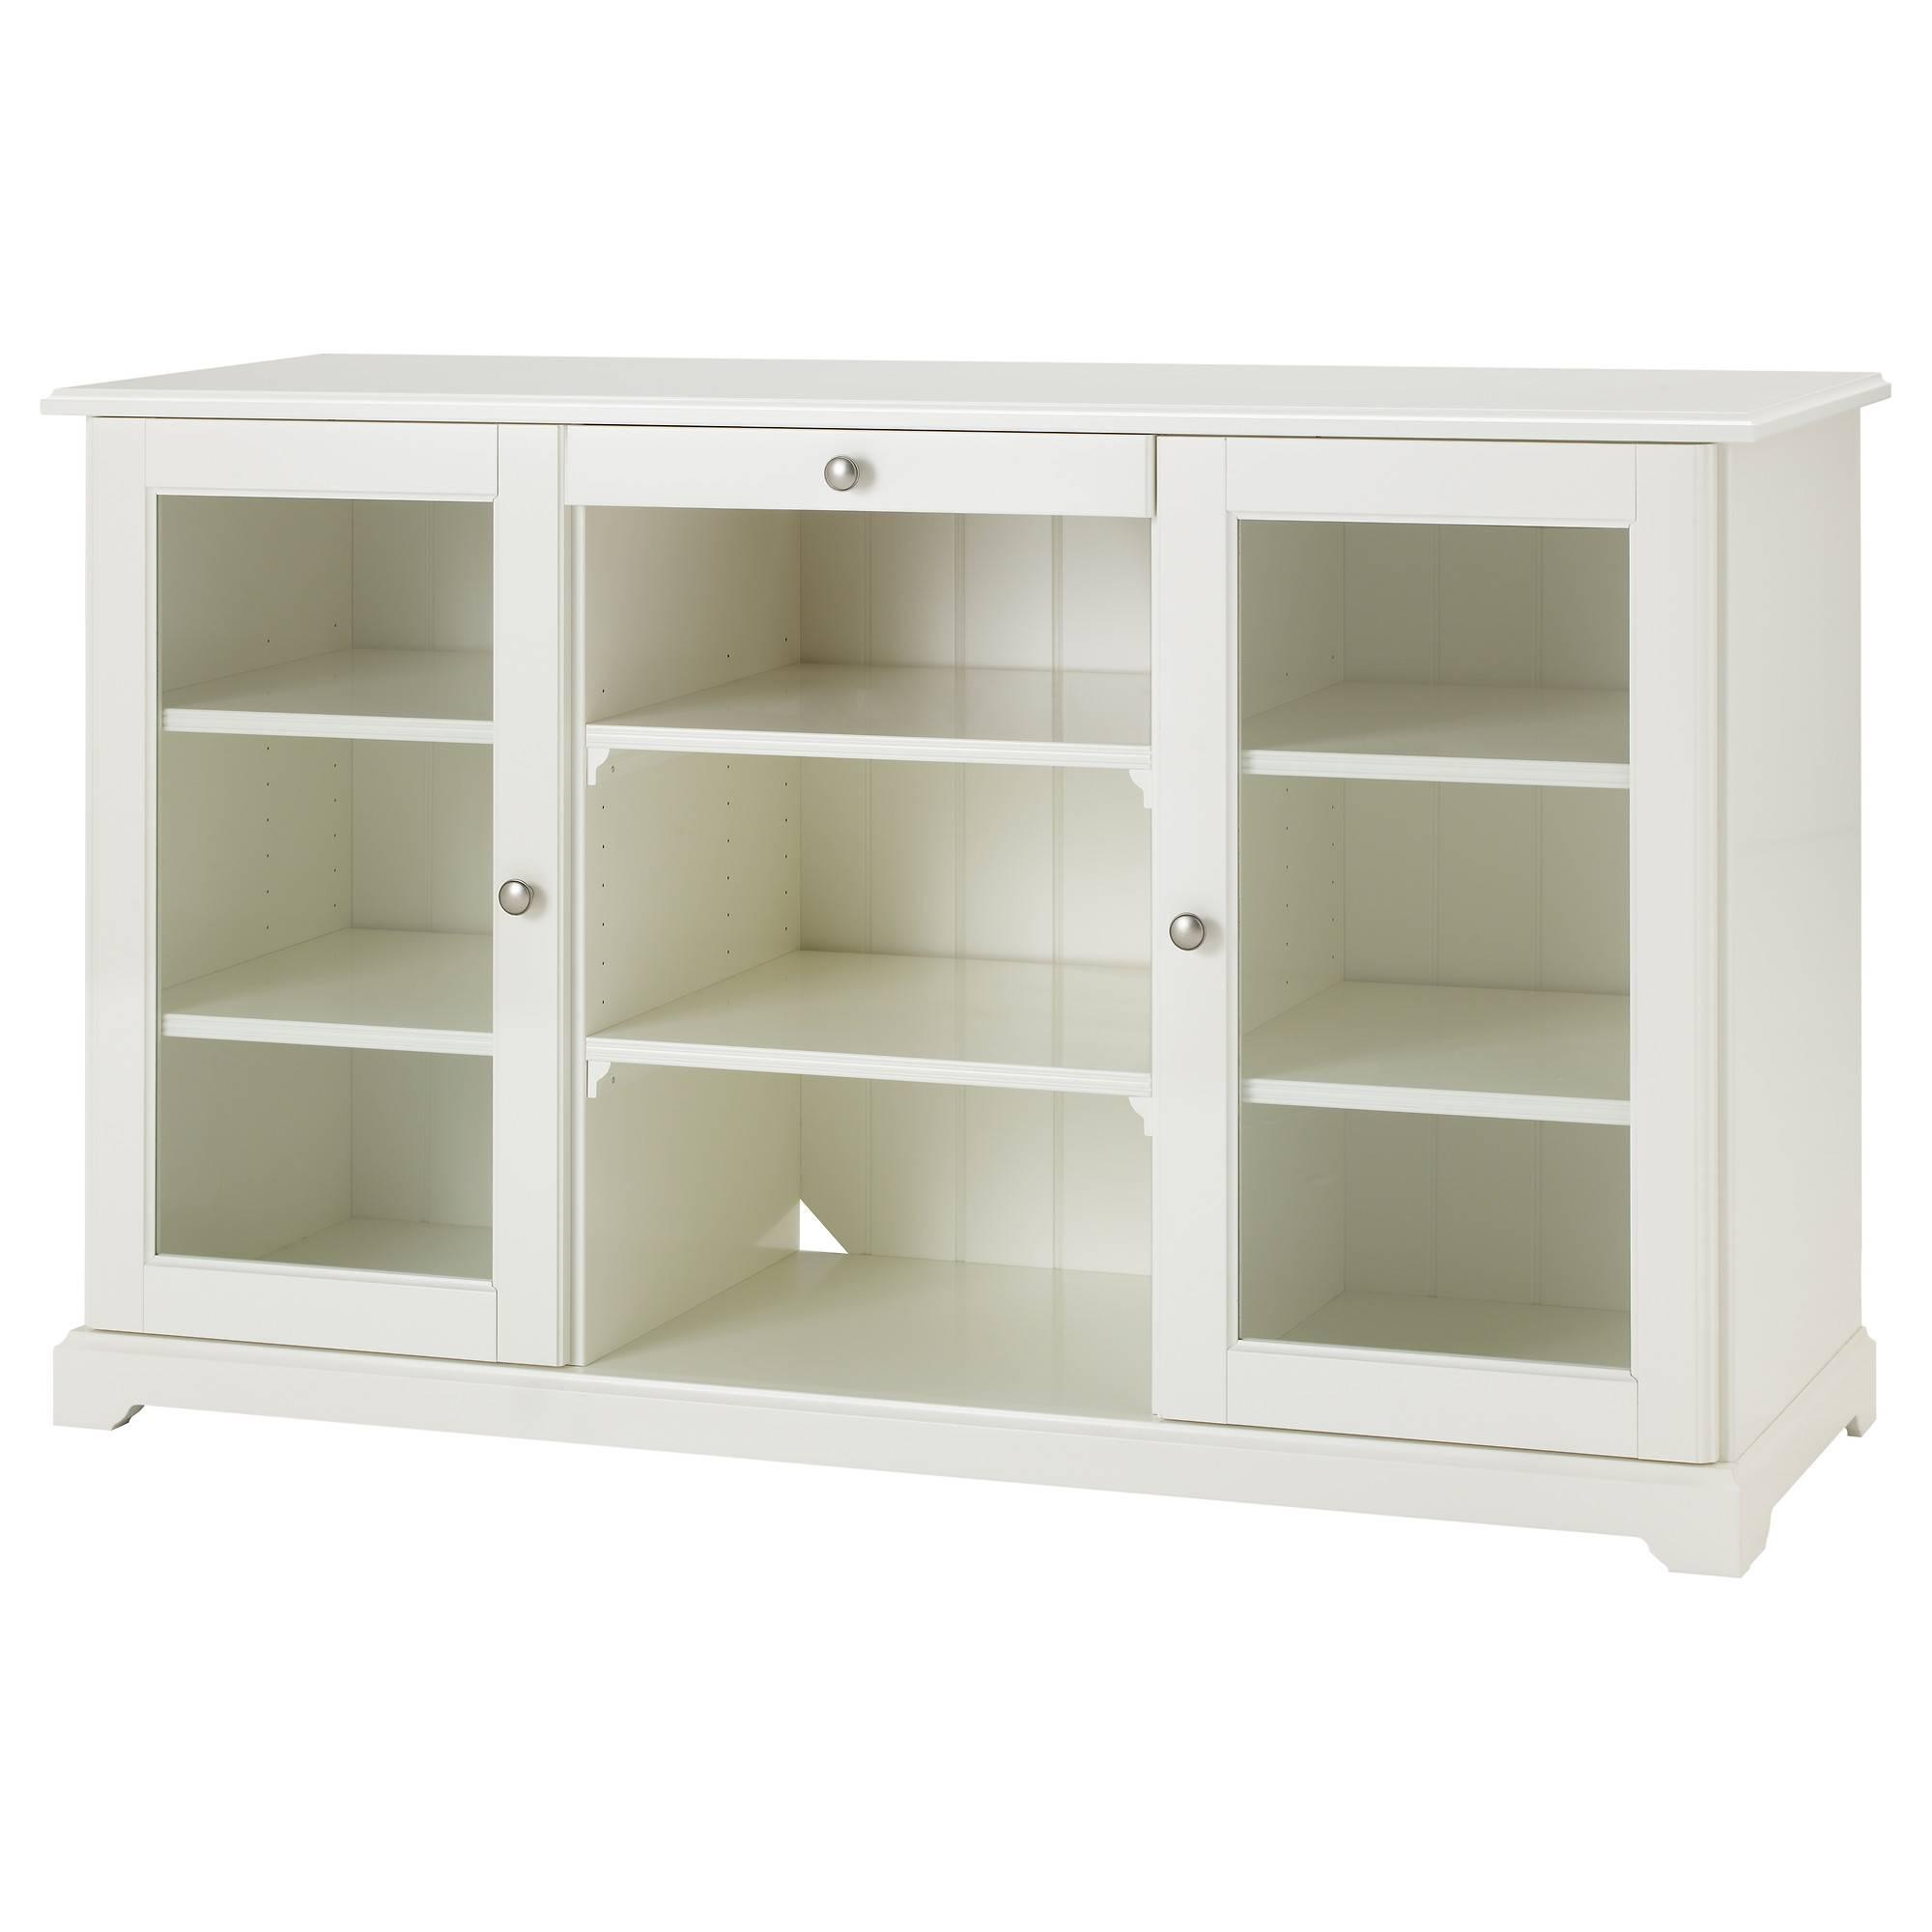 Buffet Tables & Sideboards - Ikea regarding 14 Inch Deep Sideboards (Image 3 of 15)